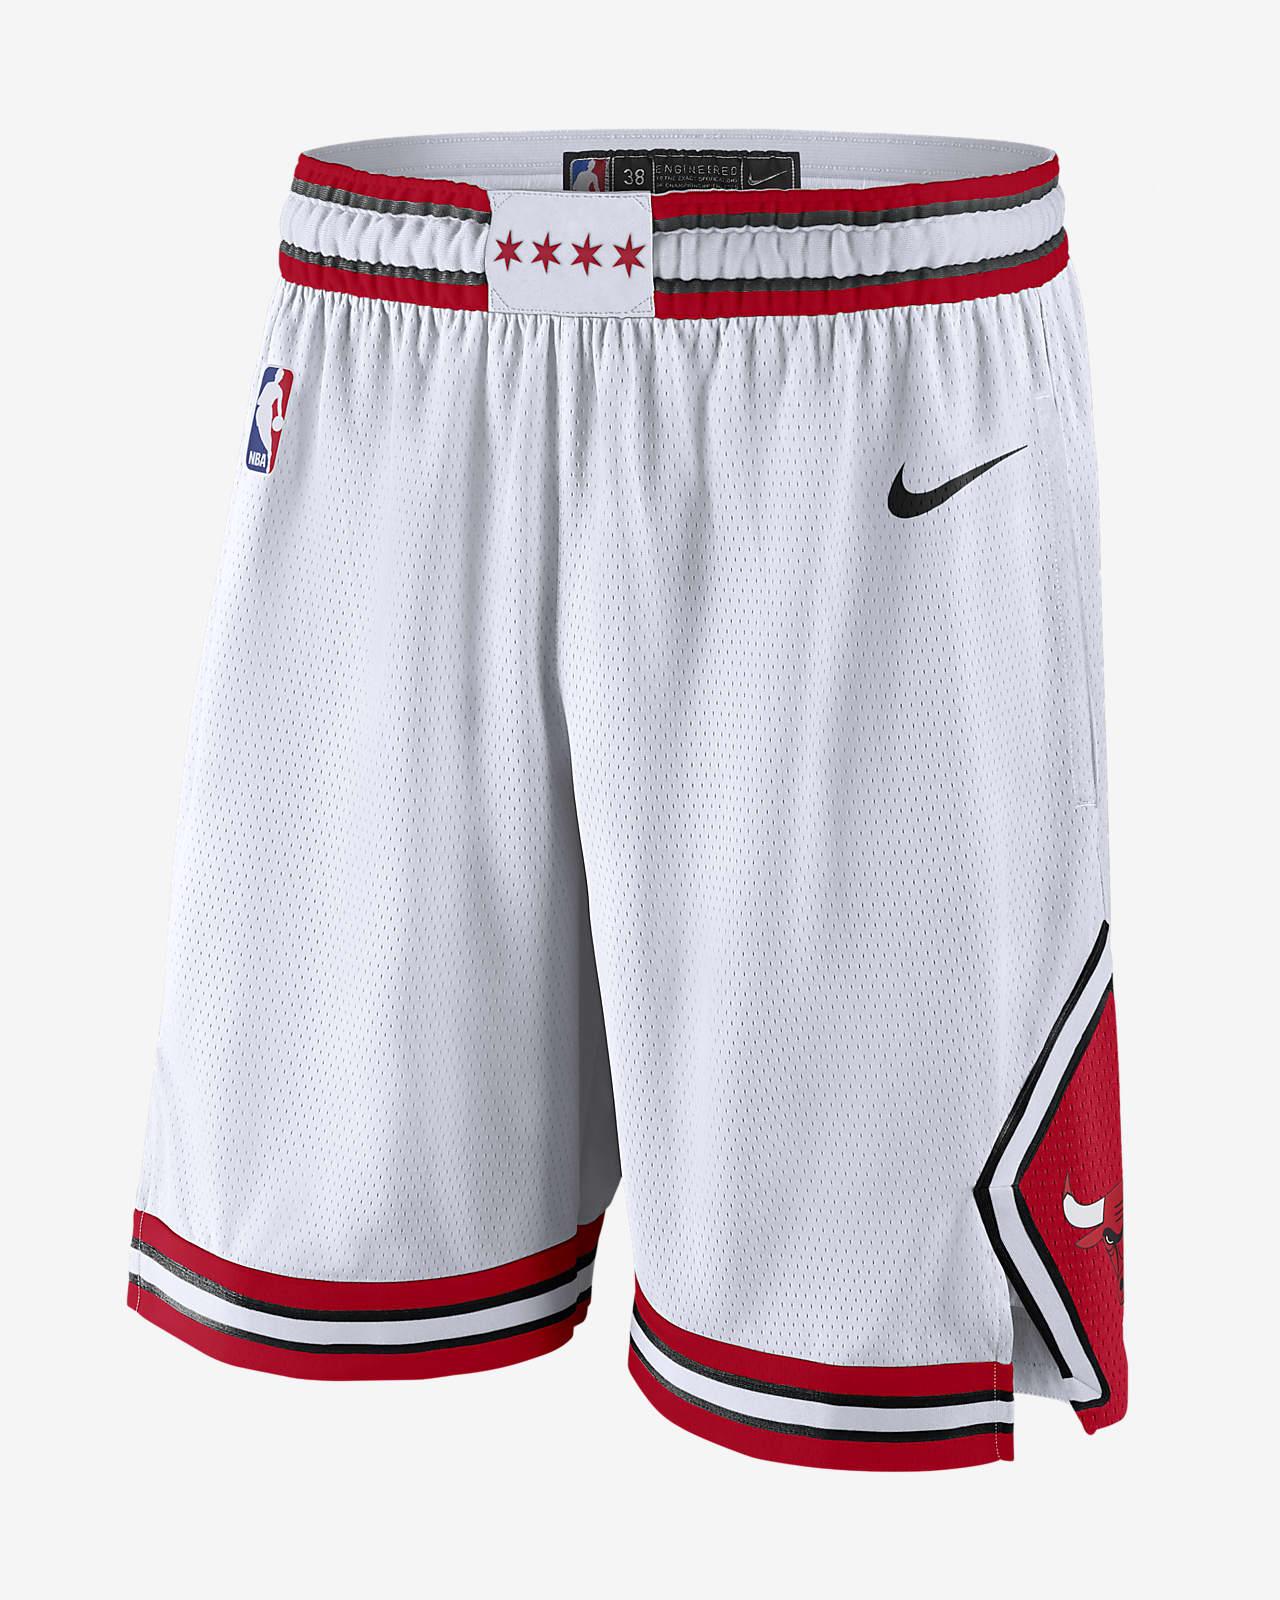 Chicago Bulls Association Edition Men's Nike NBA Swingman Shorts